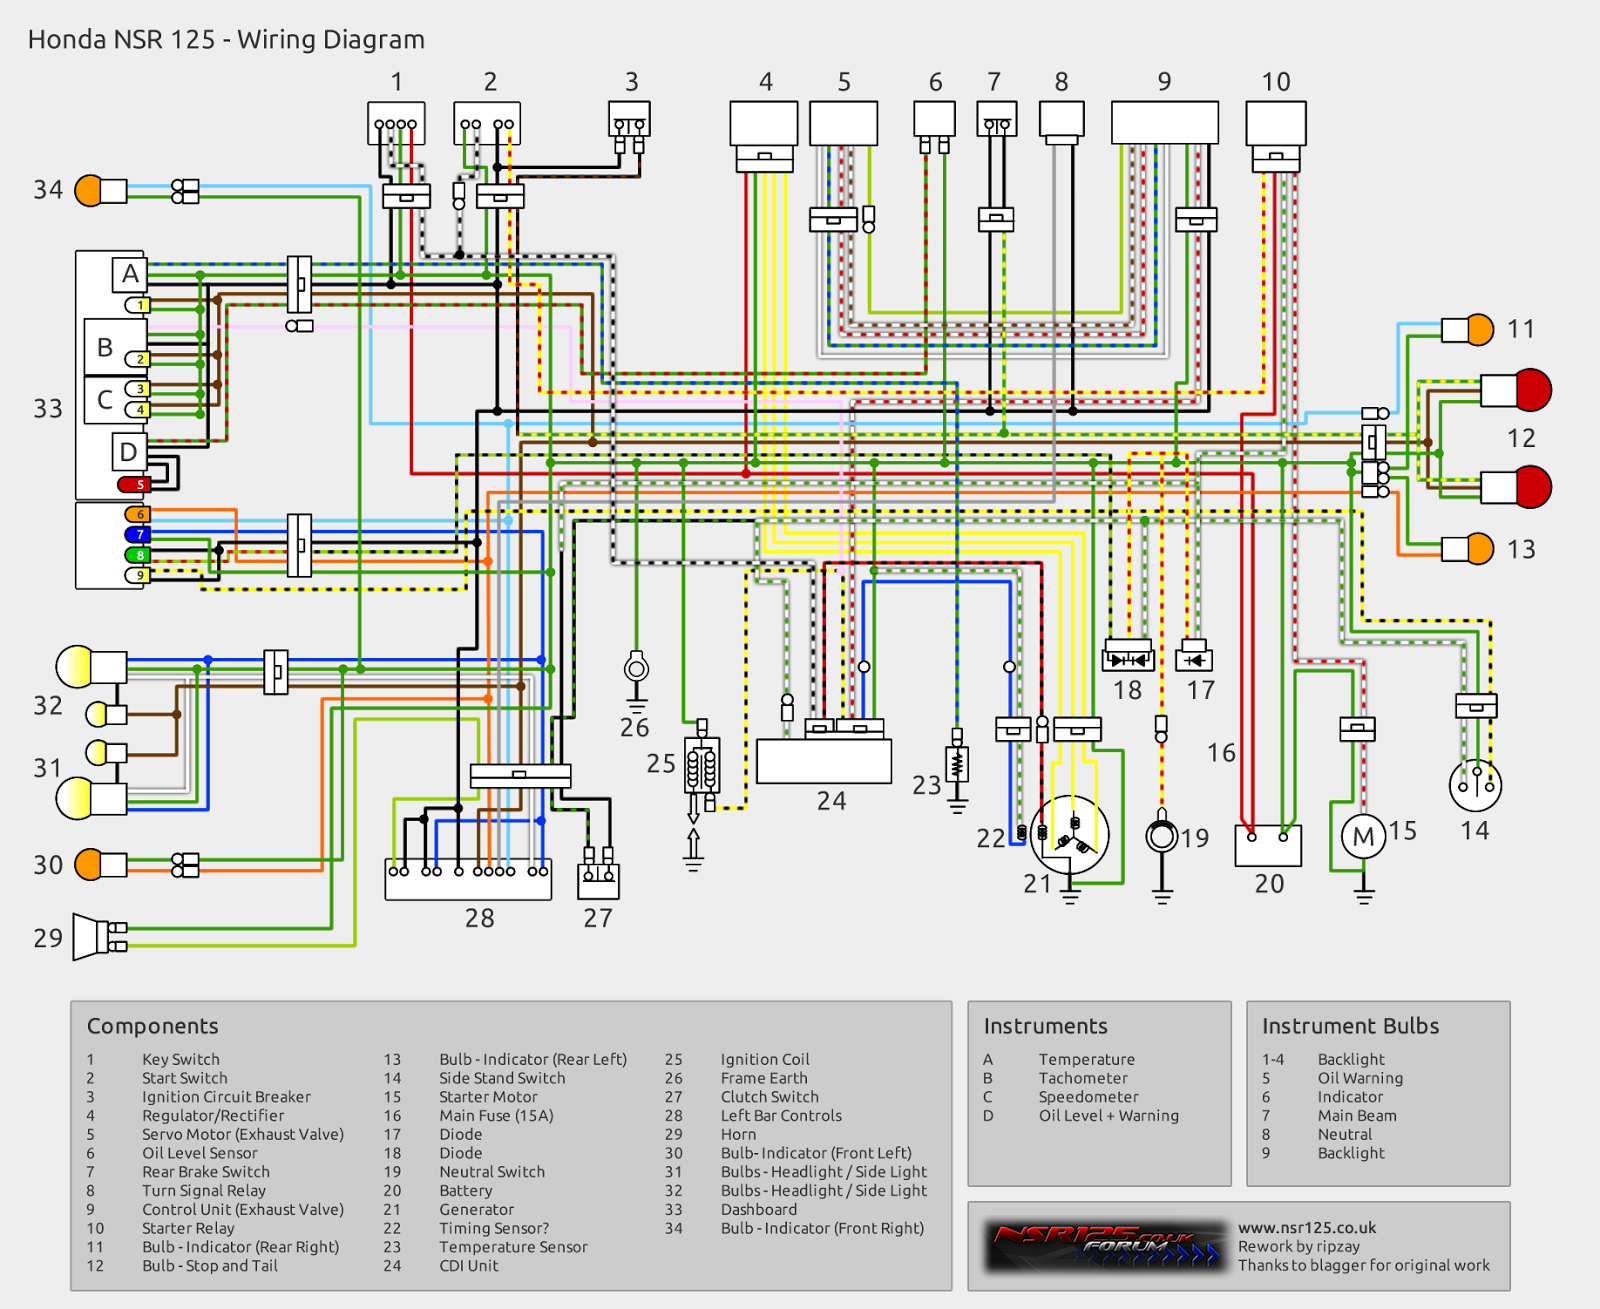 yamaha r6 tail light wiring diagram suzuki c50 wiring 2003 yamaha r1 wiring diagram 2000 yamaha r1 service manual [ 1600 x 1309 Pixel ]